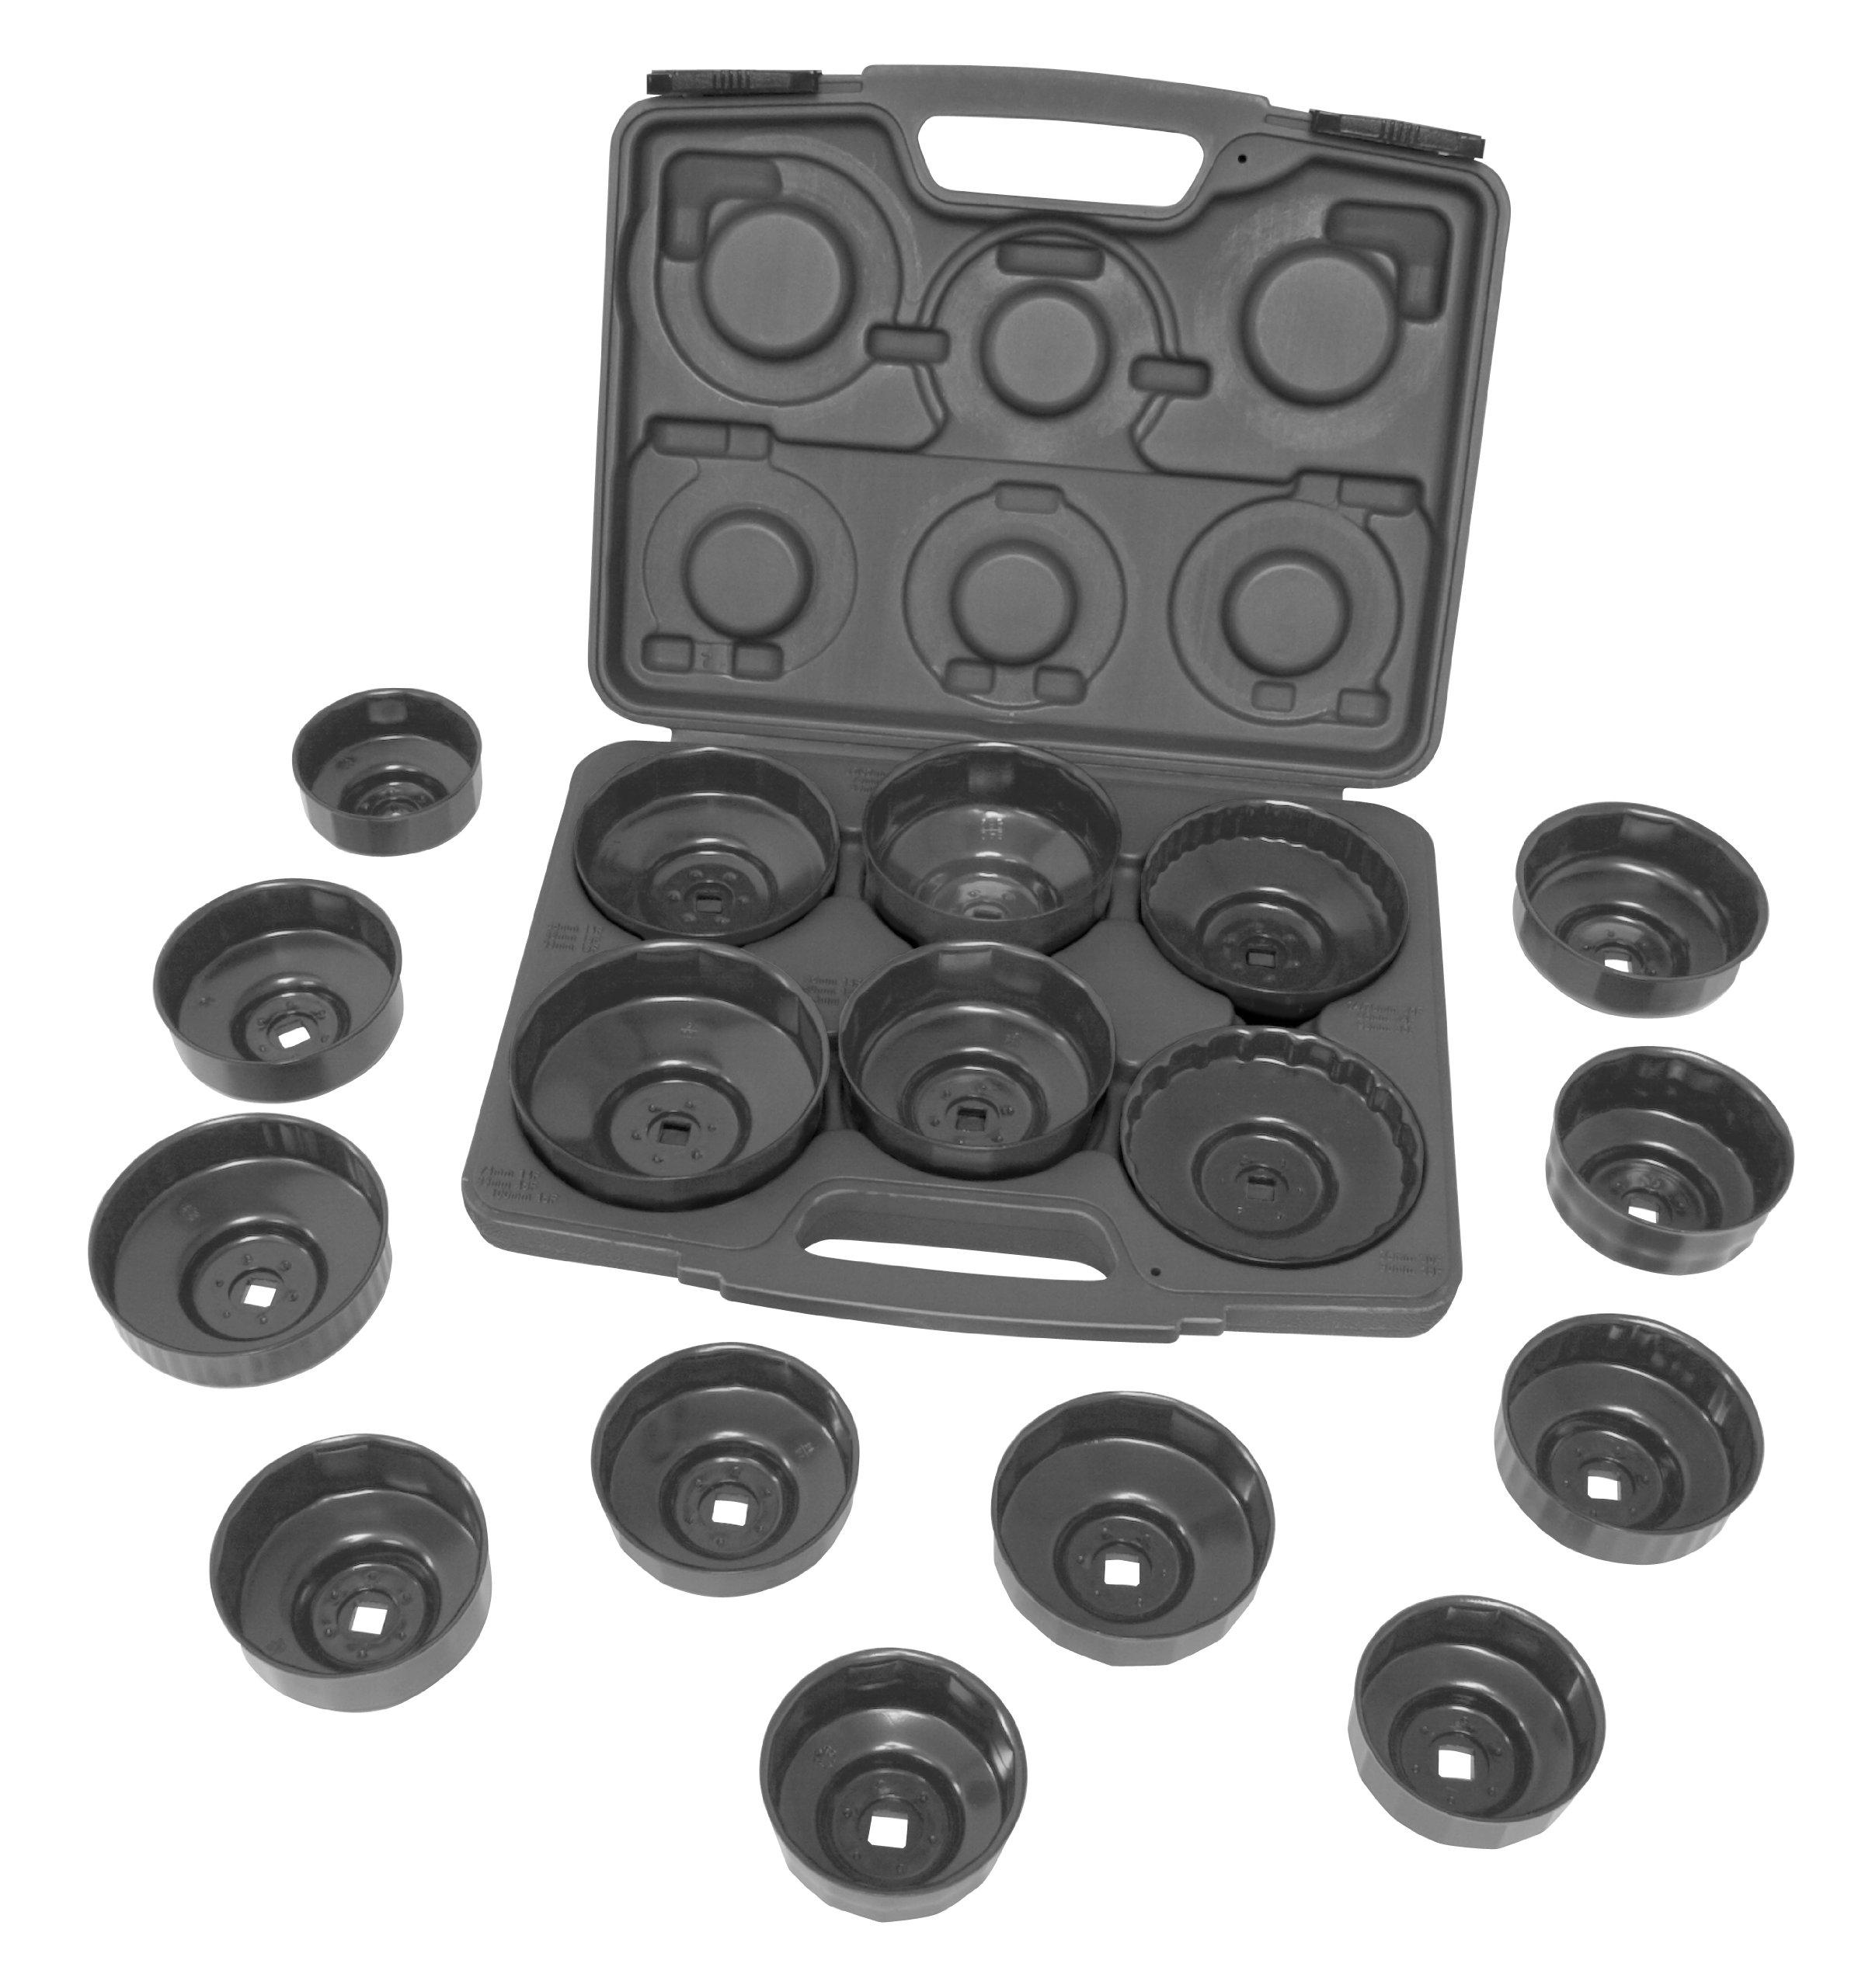 Lisle 61500 17-Piece HD End Cap Wrench Set